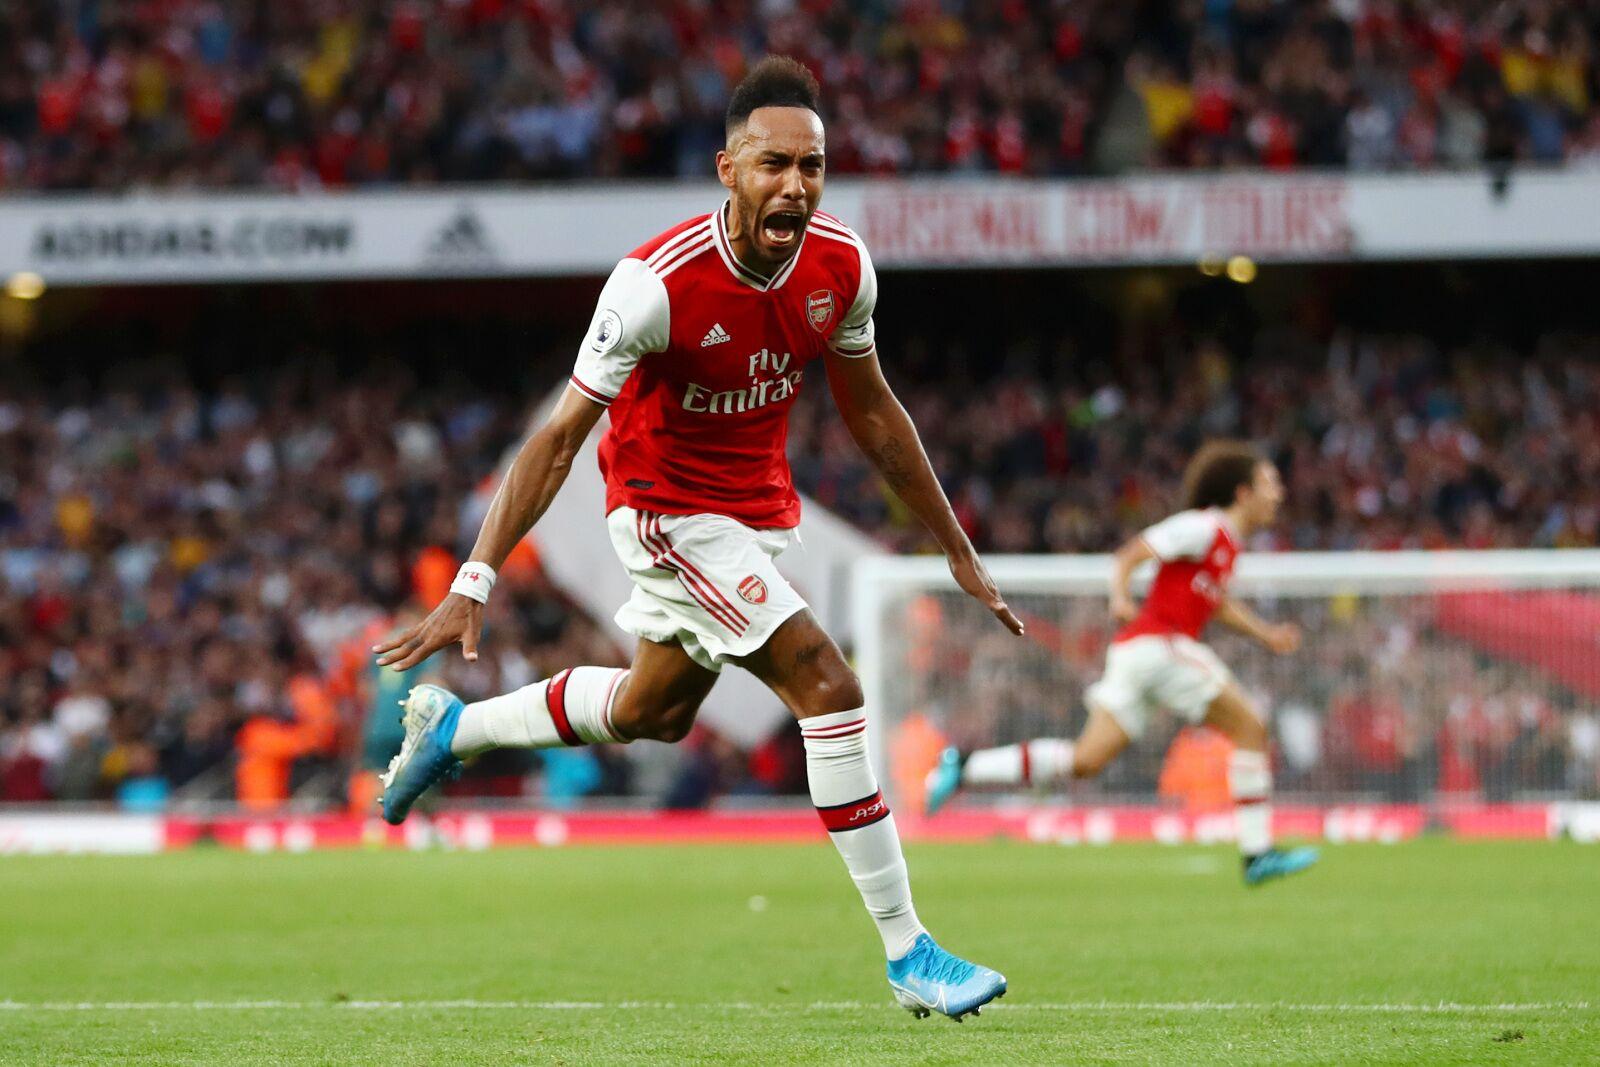 World-Class Pierre-Emerick Aubameyang saves Arsenal yet again